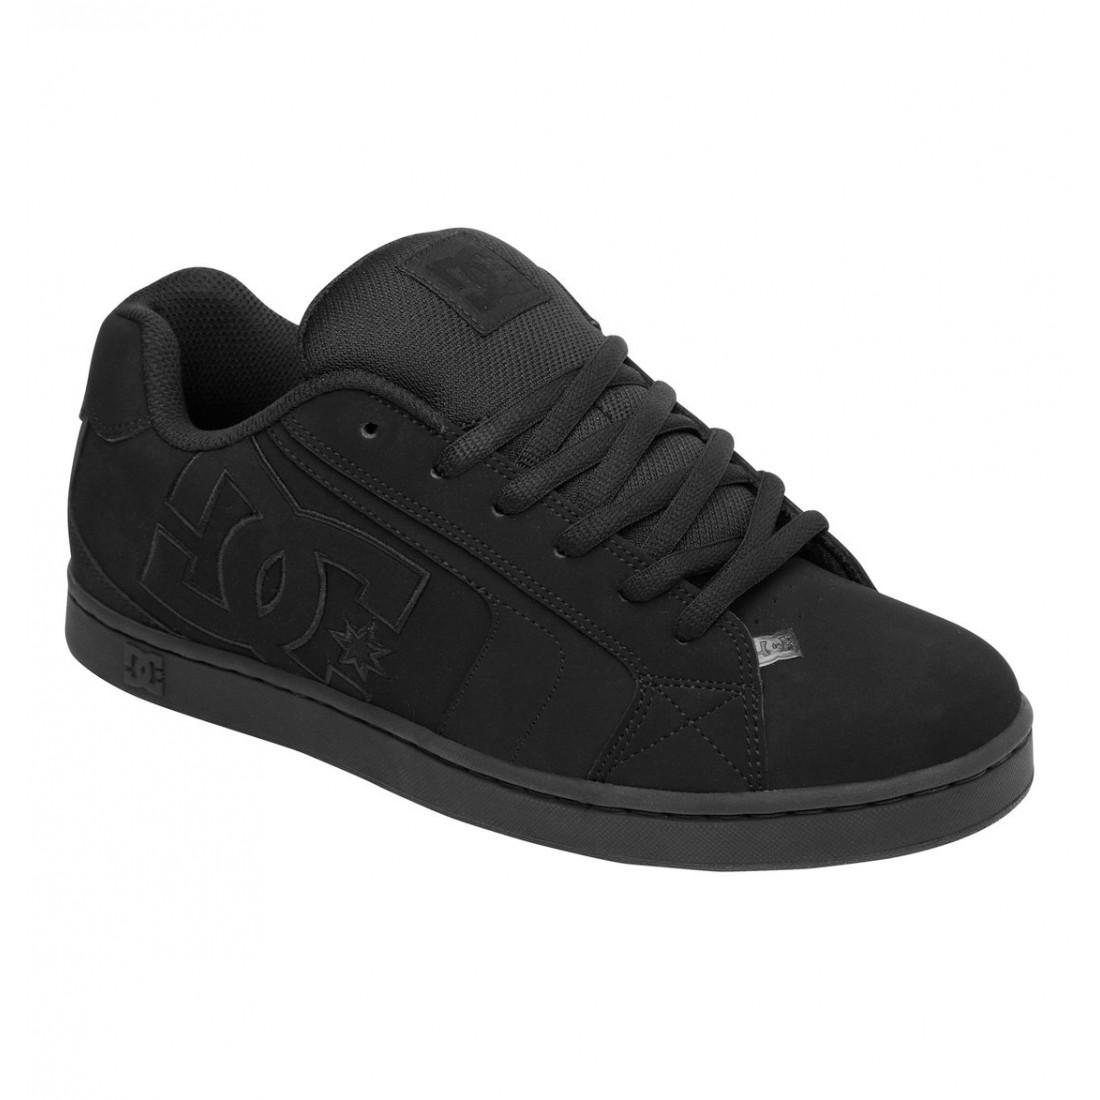 NET black black black